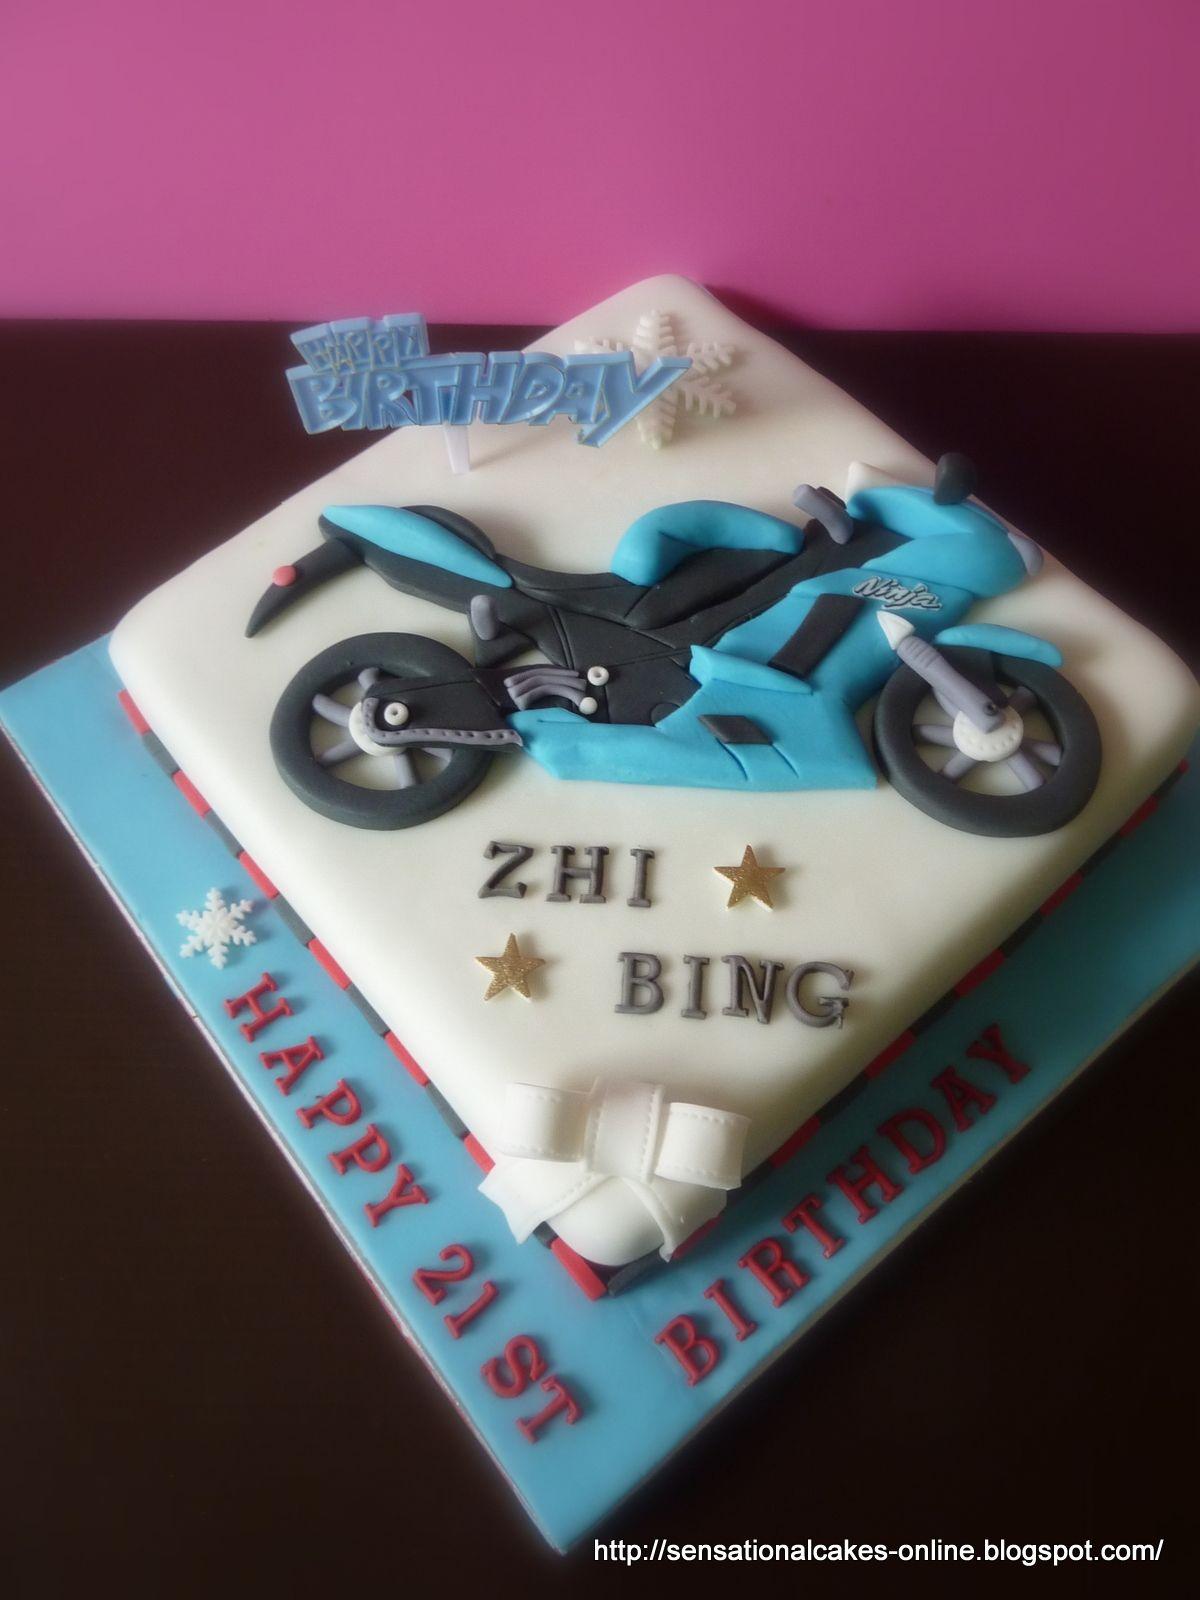 Kawasaki Ninja Motorbike Theme Cake Singapore Happy 21st Birthday